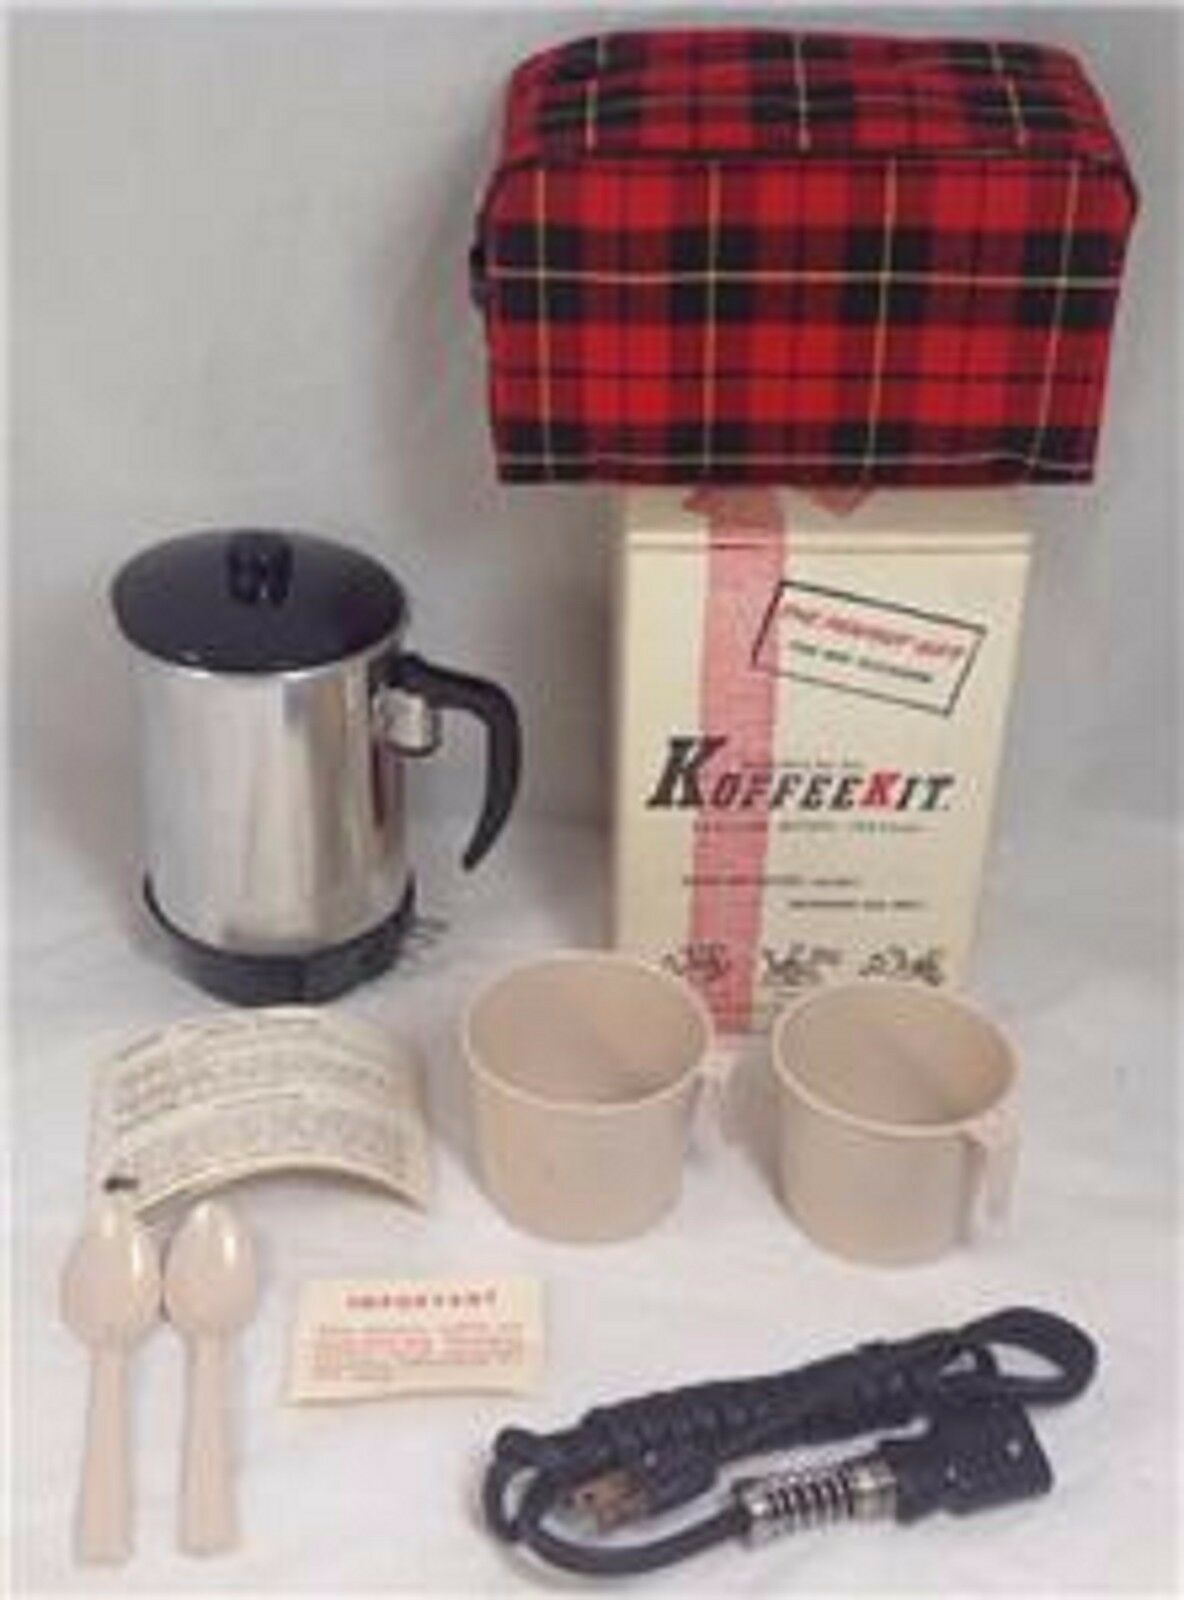 Keefe 60's Aluminum INSTANT Coffee/Tea Pot Model 225, Box, Case & Cups, Bakelite - $39.60